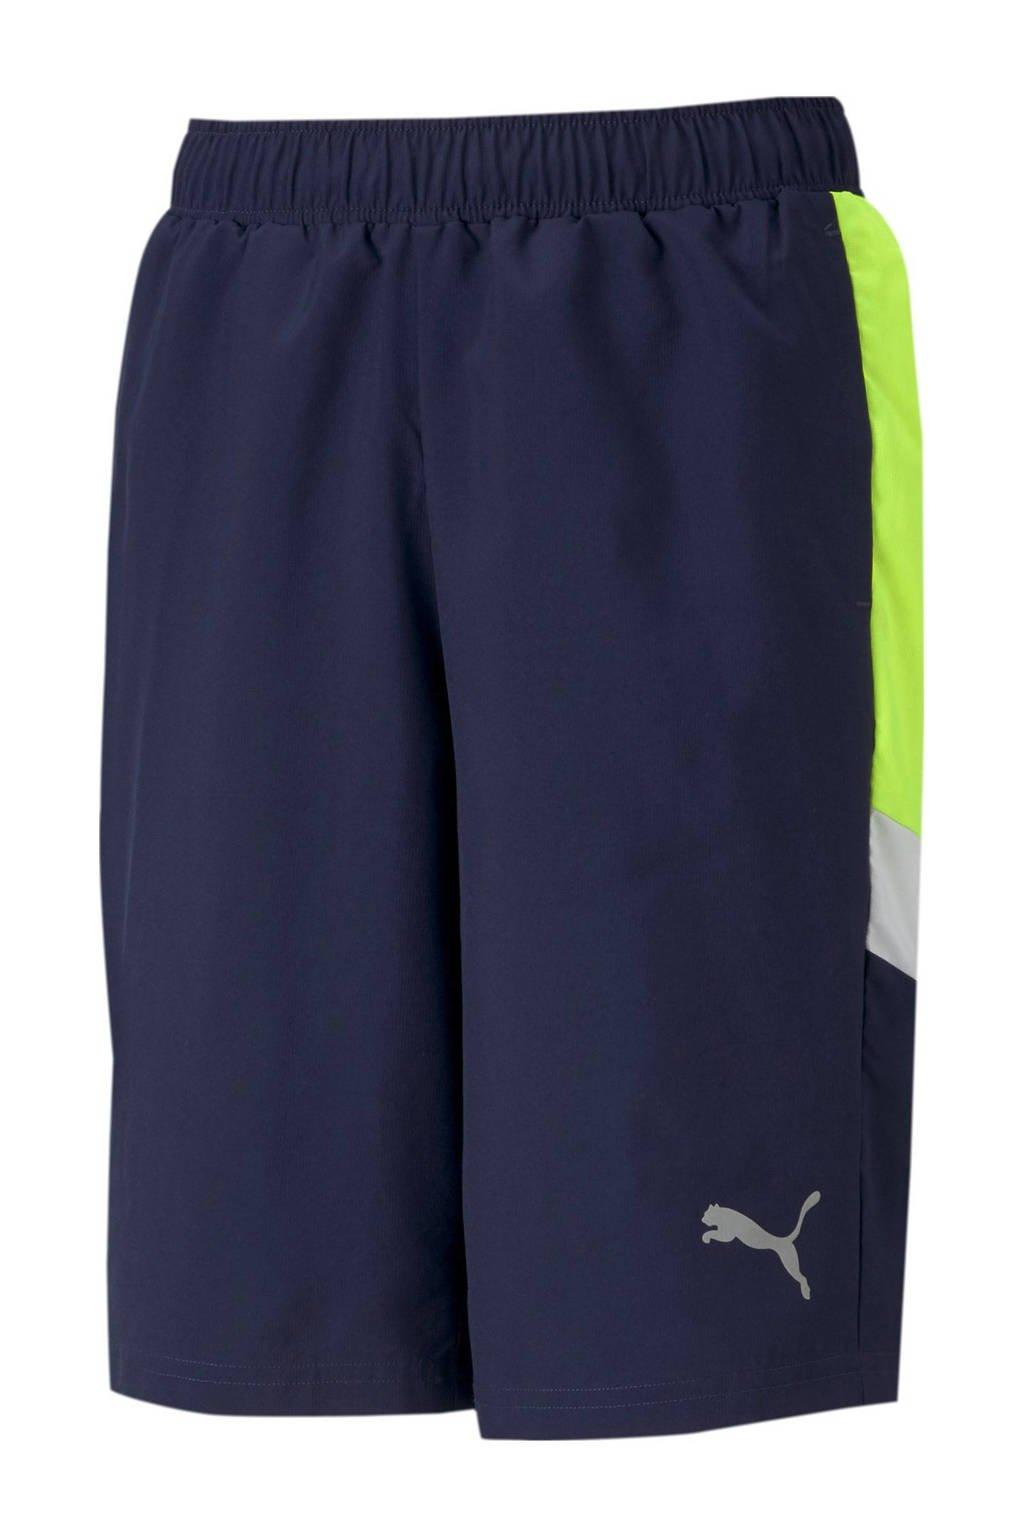 Puma short donkerblauw/limegroen/wit, Donkerblauw/limegroen/wit